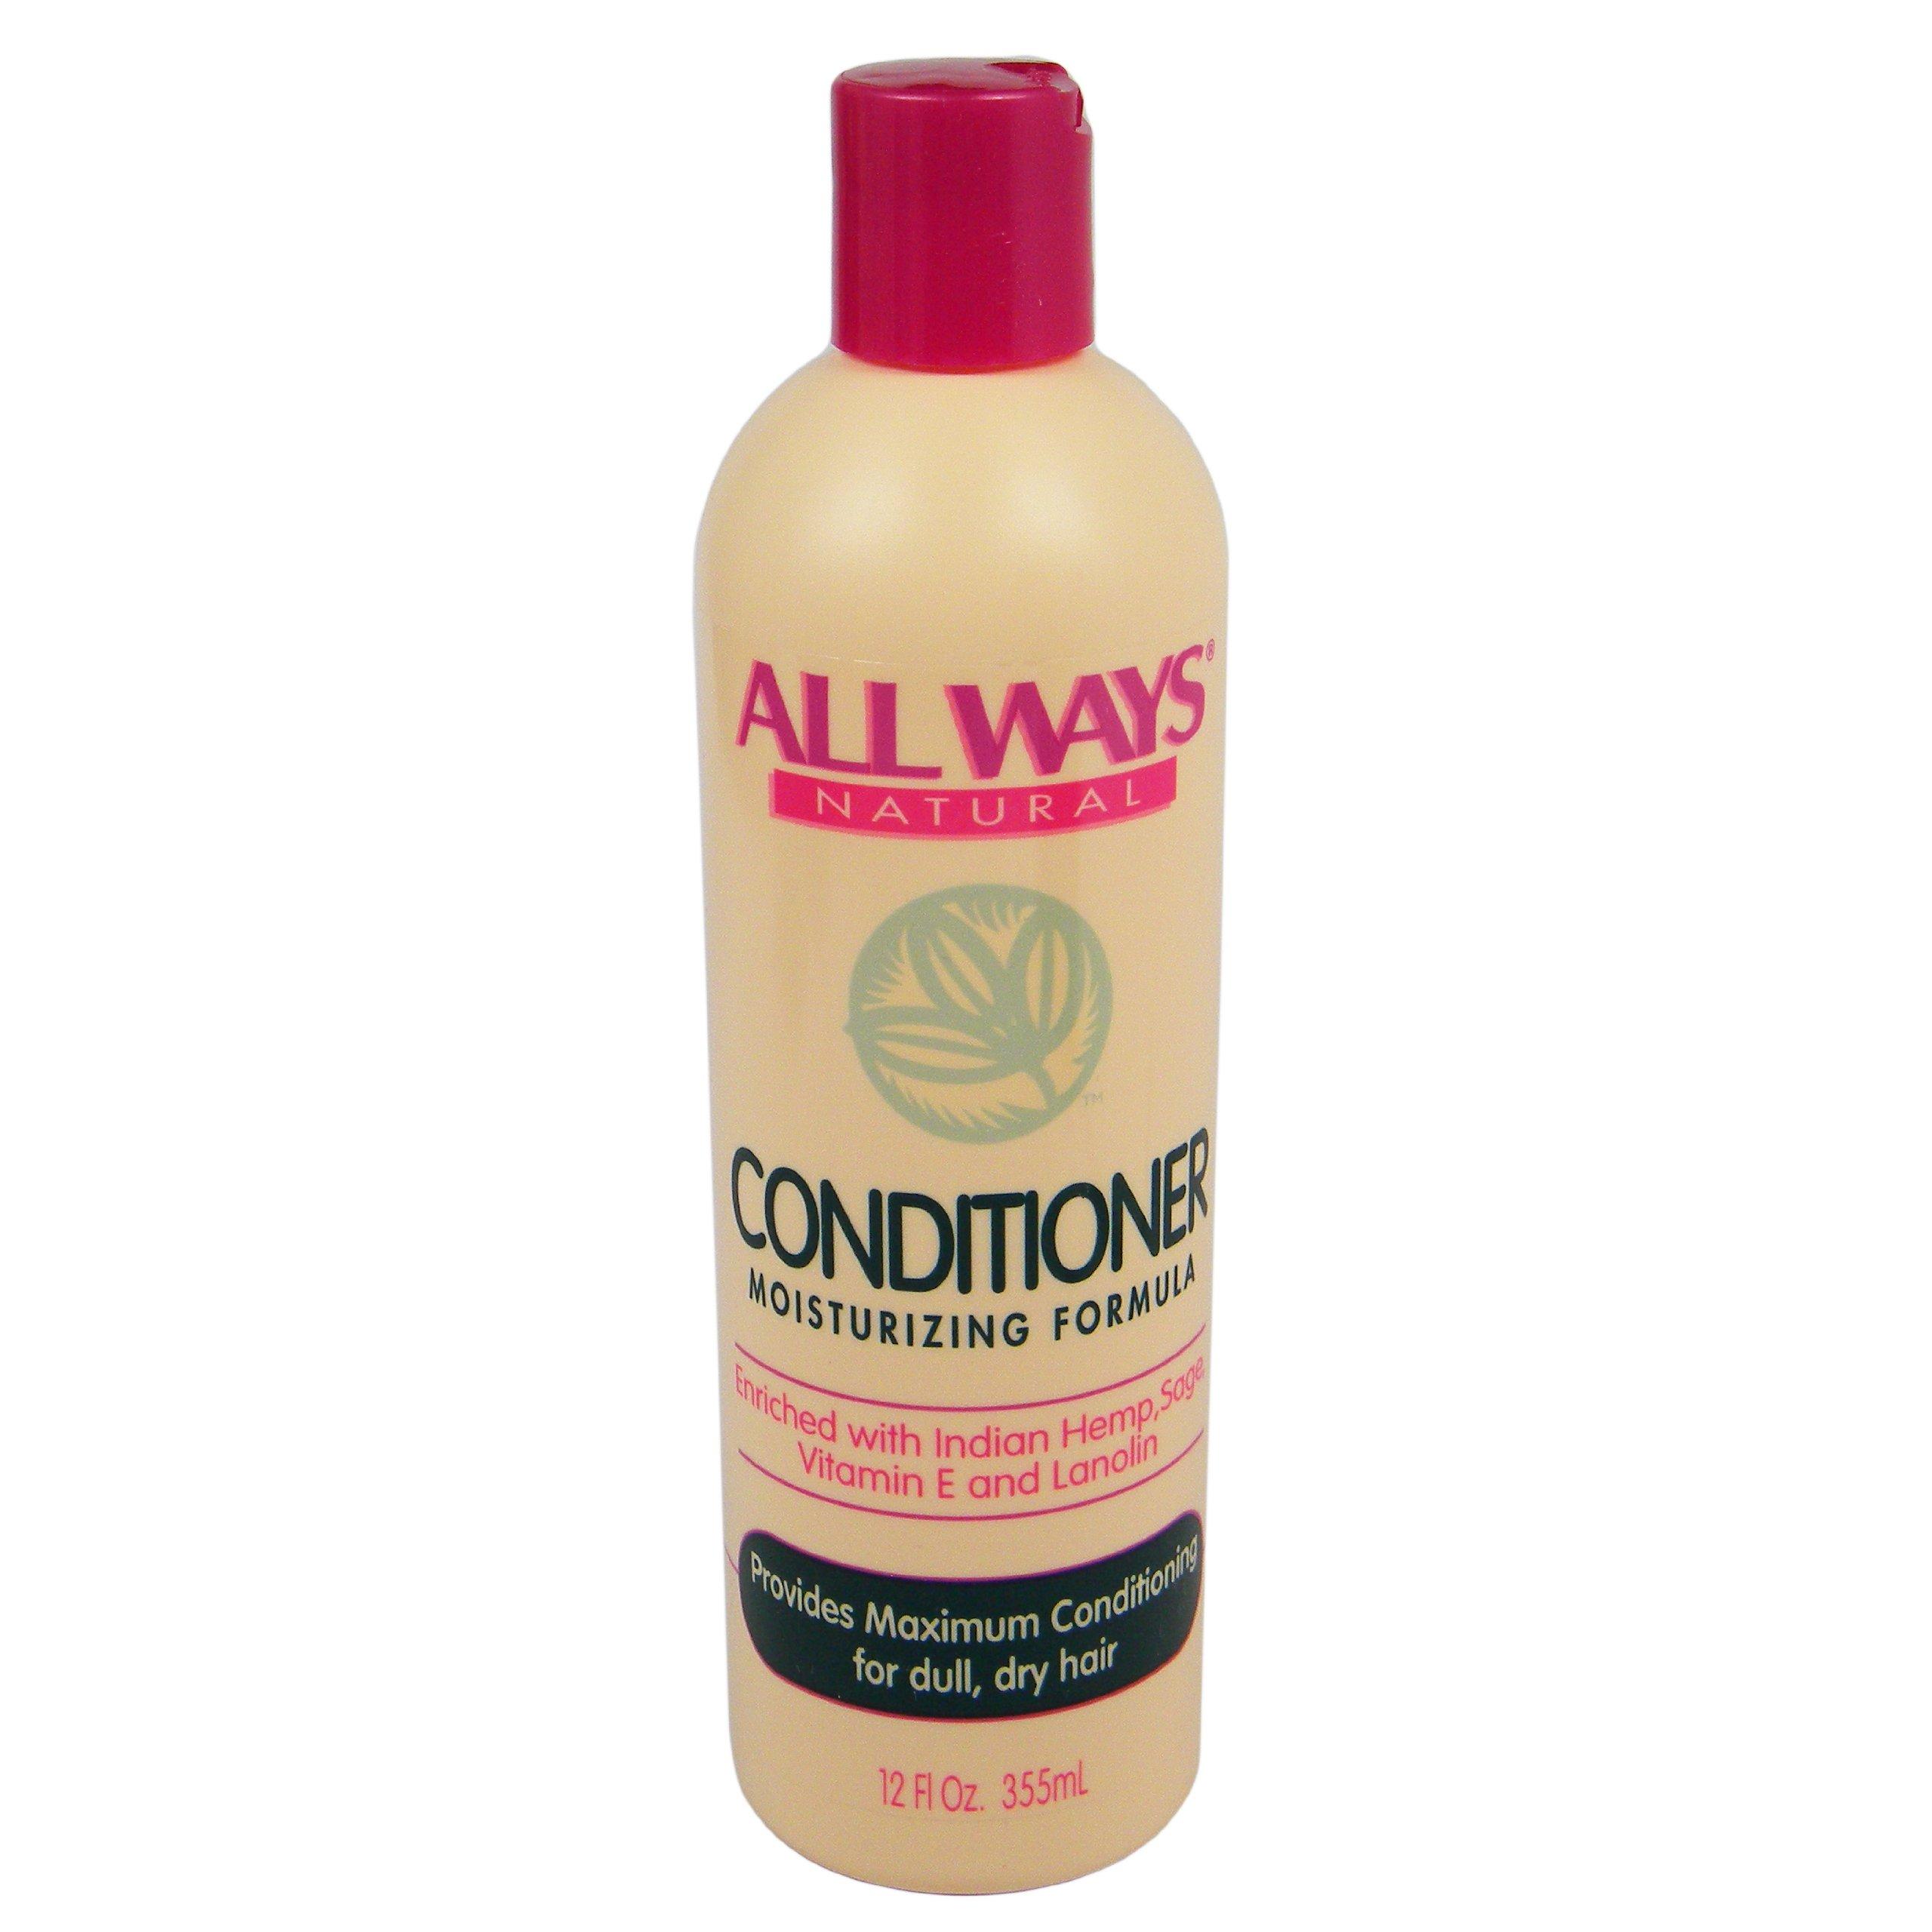 Allways Natural Conditioner Moisturizing Formula 12oz